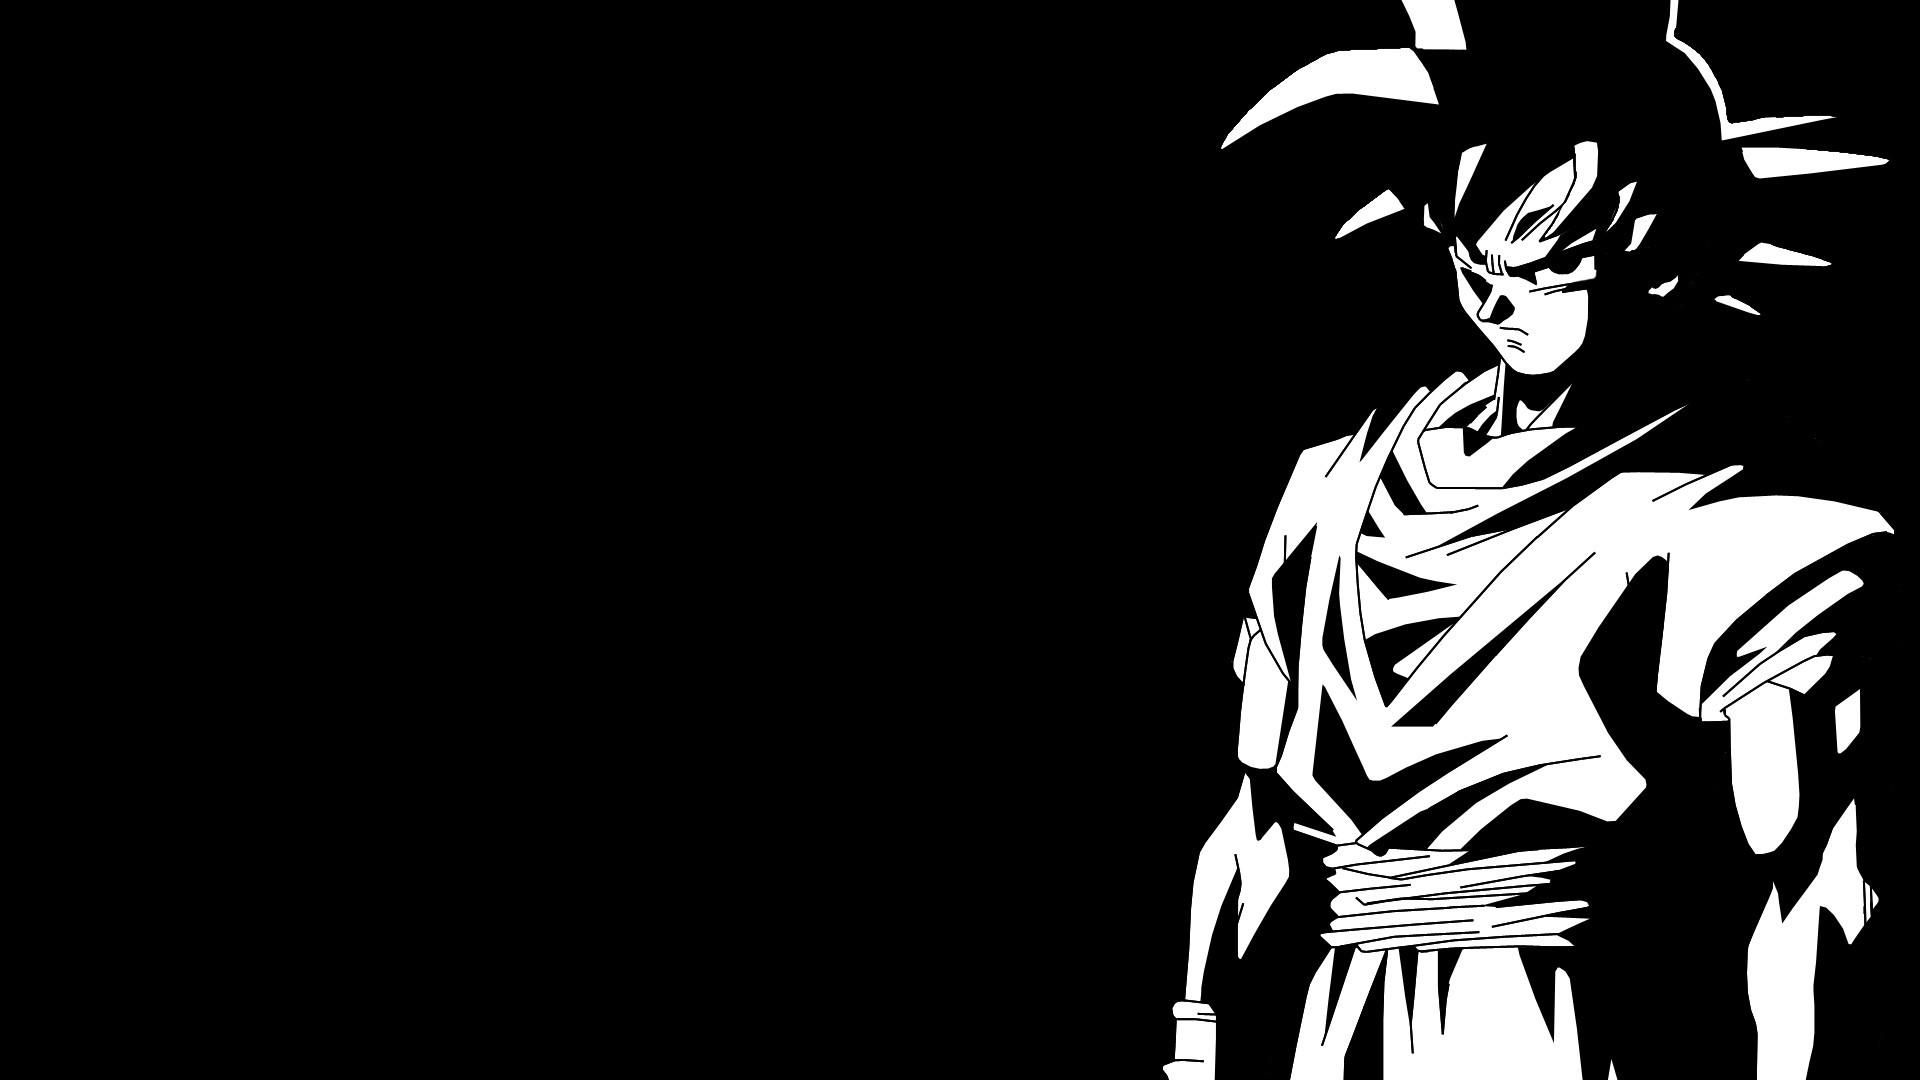 Goku Wallpapers 64 Images